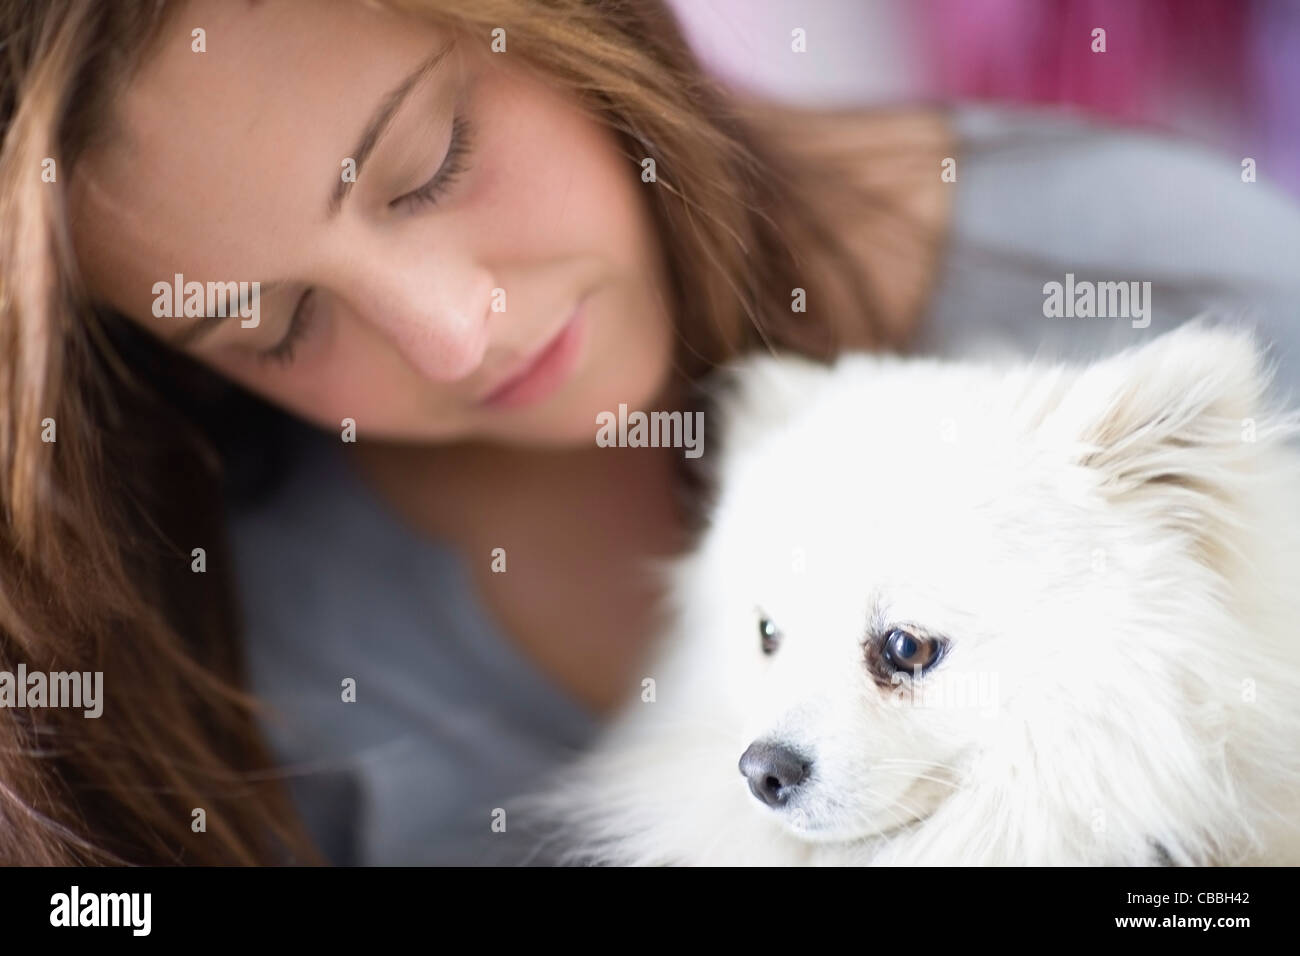 Teenage girl petting dog - Stock Image